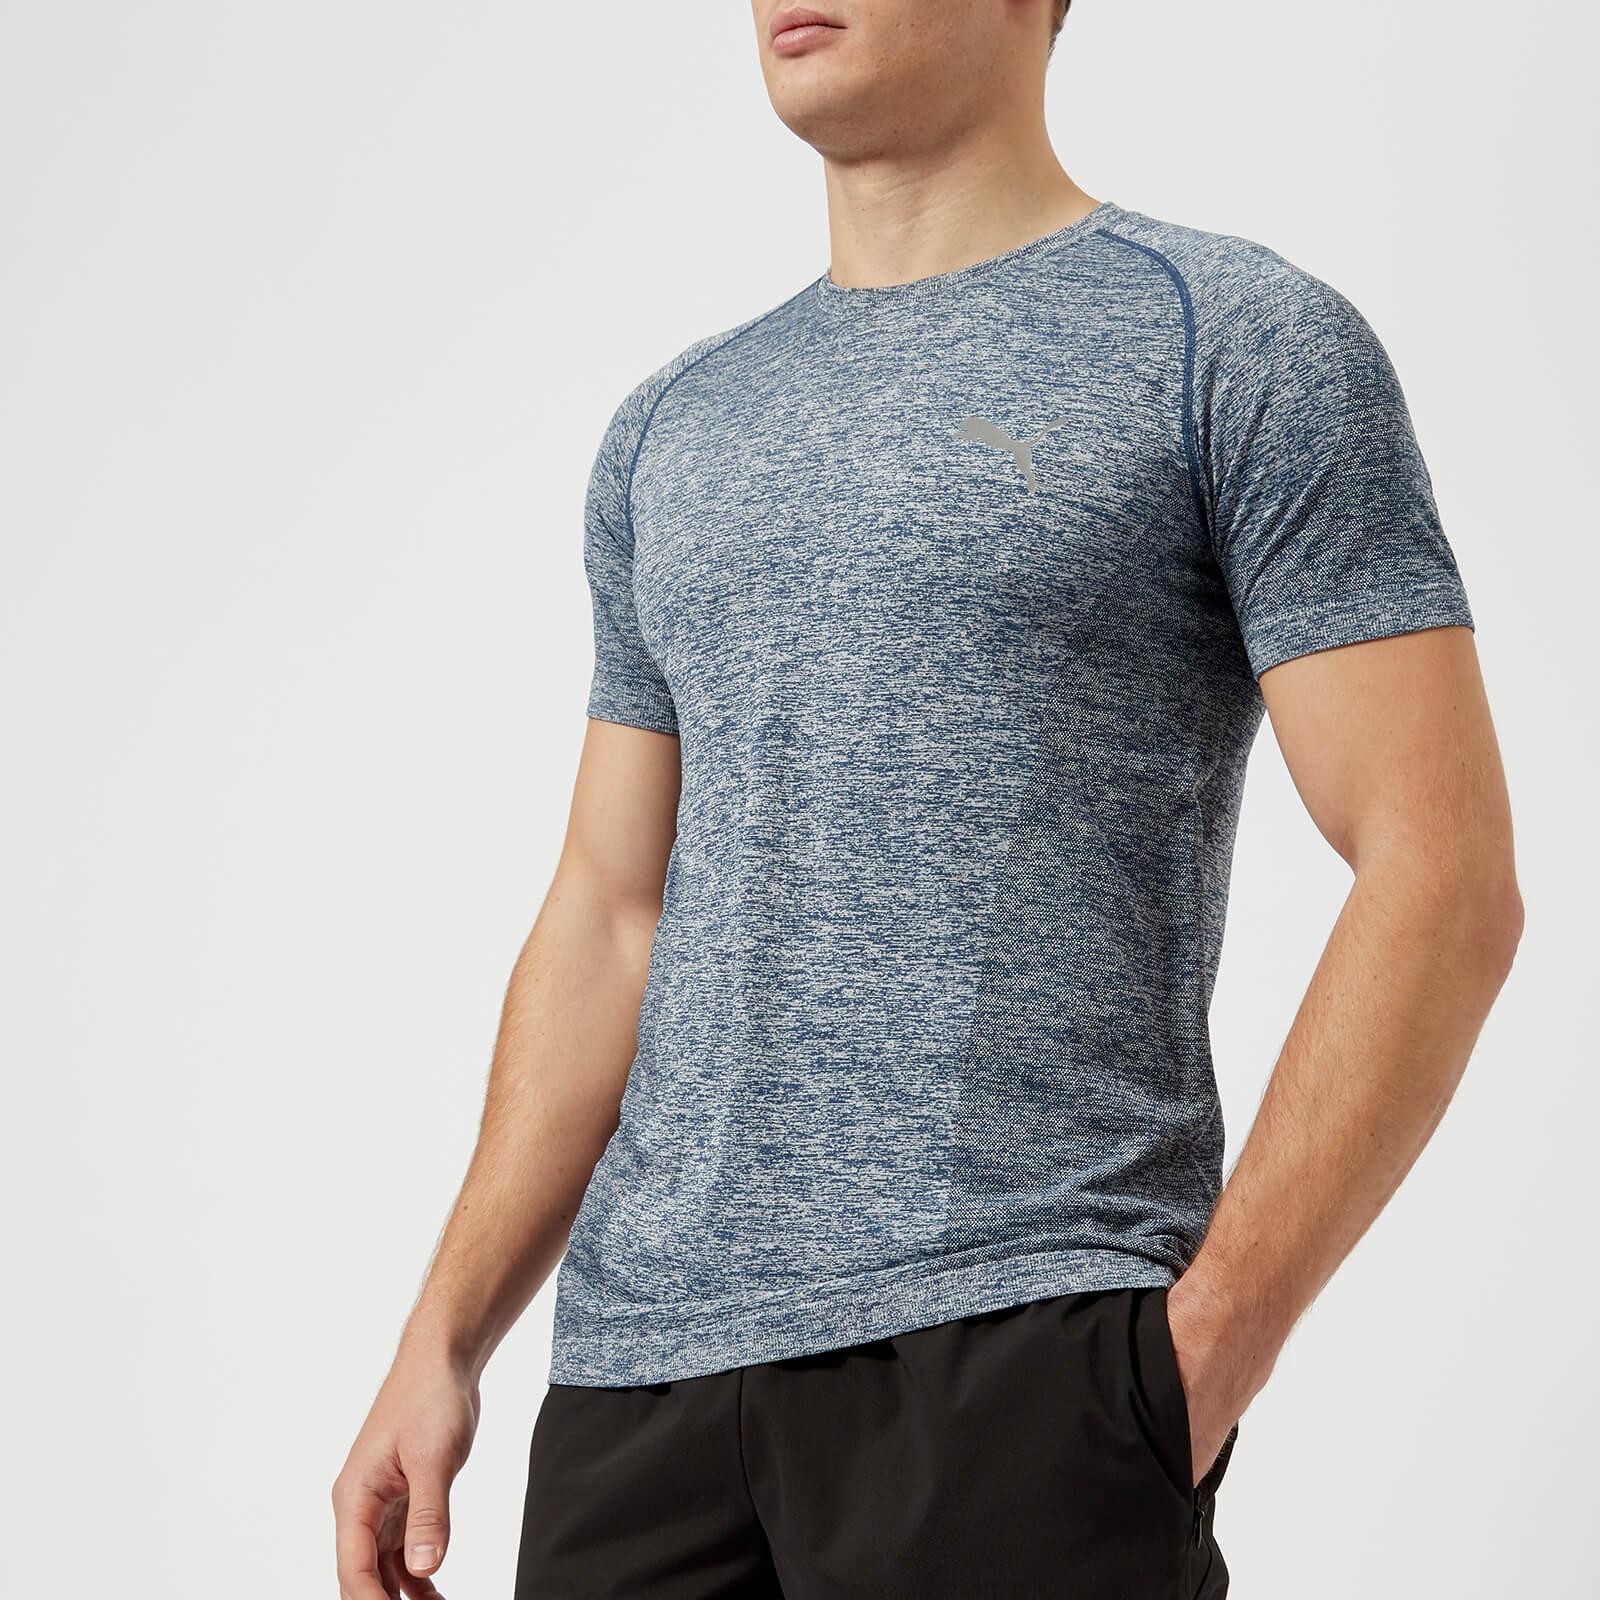 99664b232bc Puma Men's Evoknit Best Short Sleeve T-Shirt - Sargasso Sea Sports &  Leisure | TheHut.com